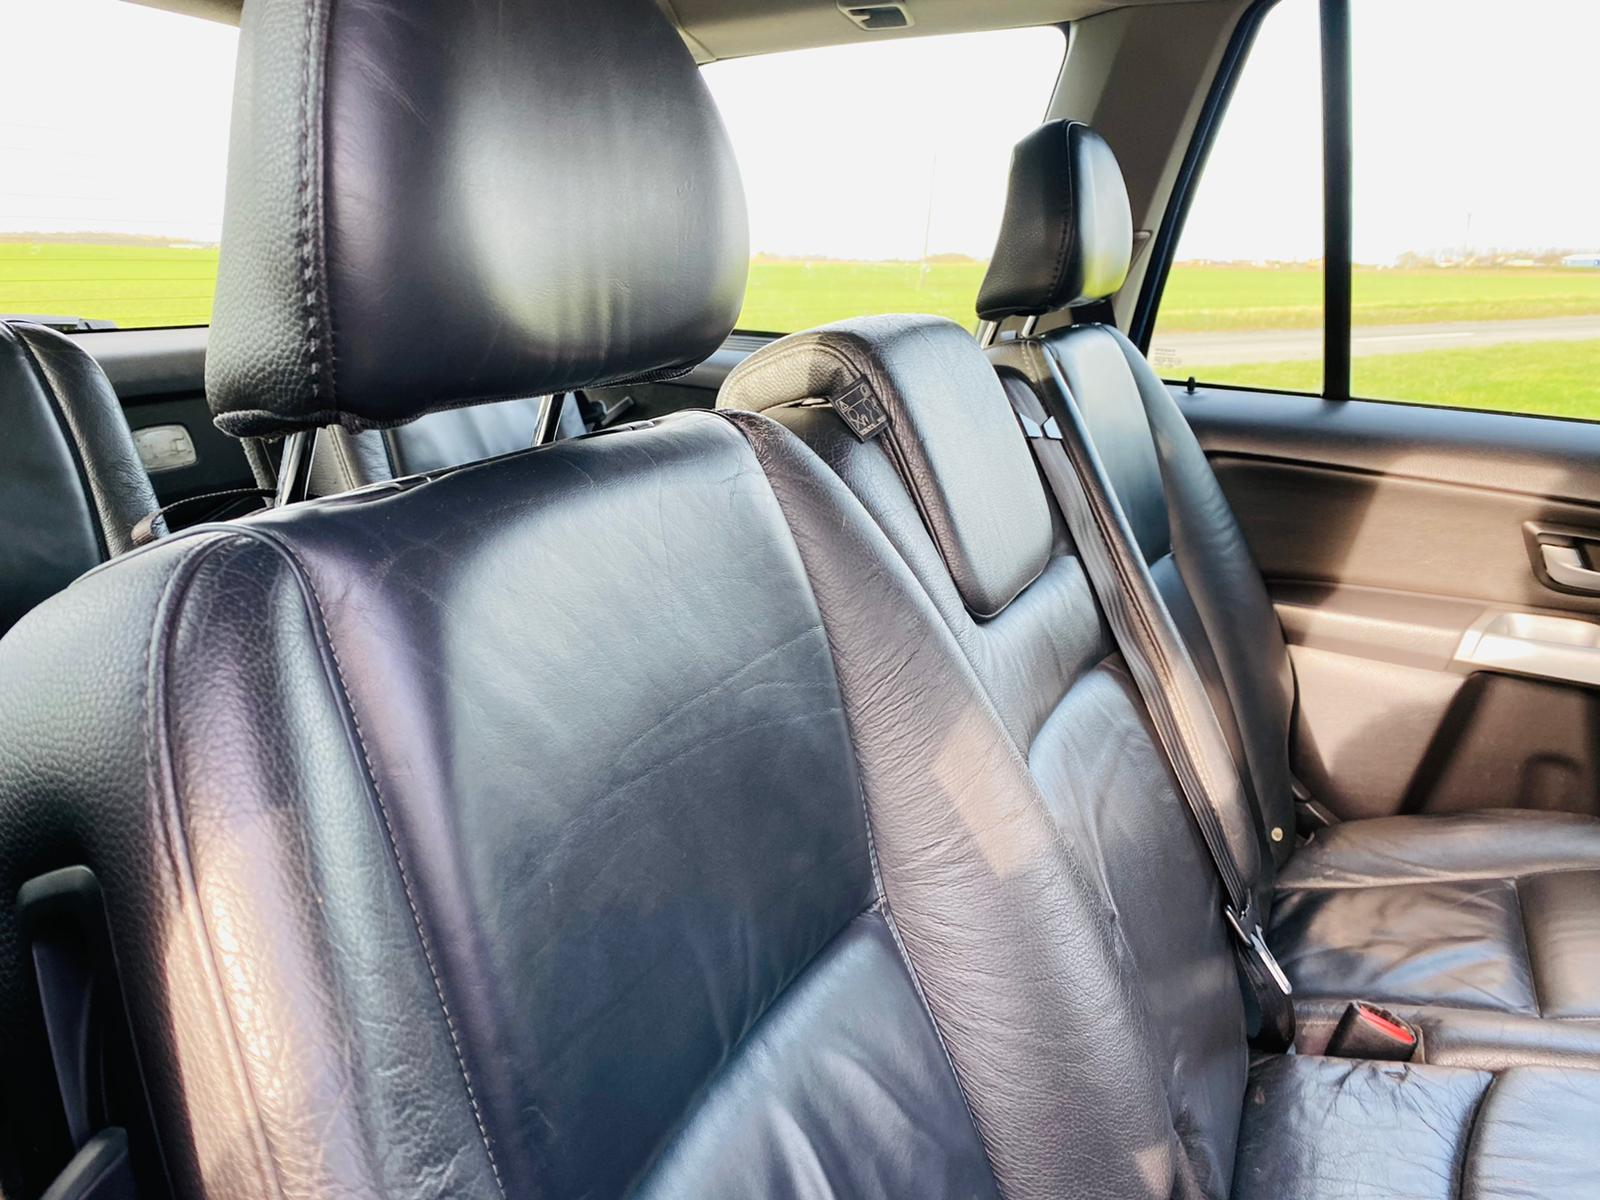 Volvo XC90 2.4 D5 185bhp SE Geartronic Auto 2006 06 Reg - 7 Seats - Air con - Top Spec - Image 32 of 47